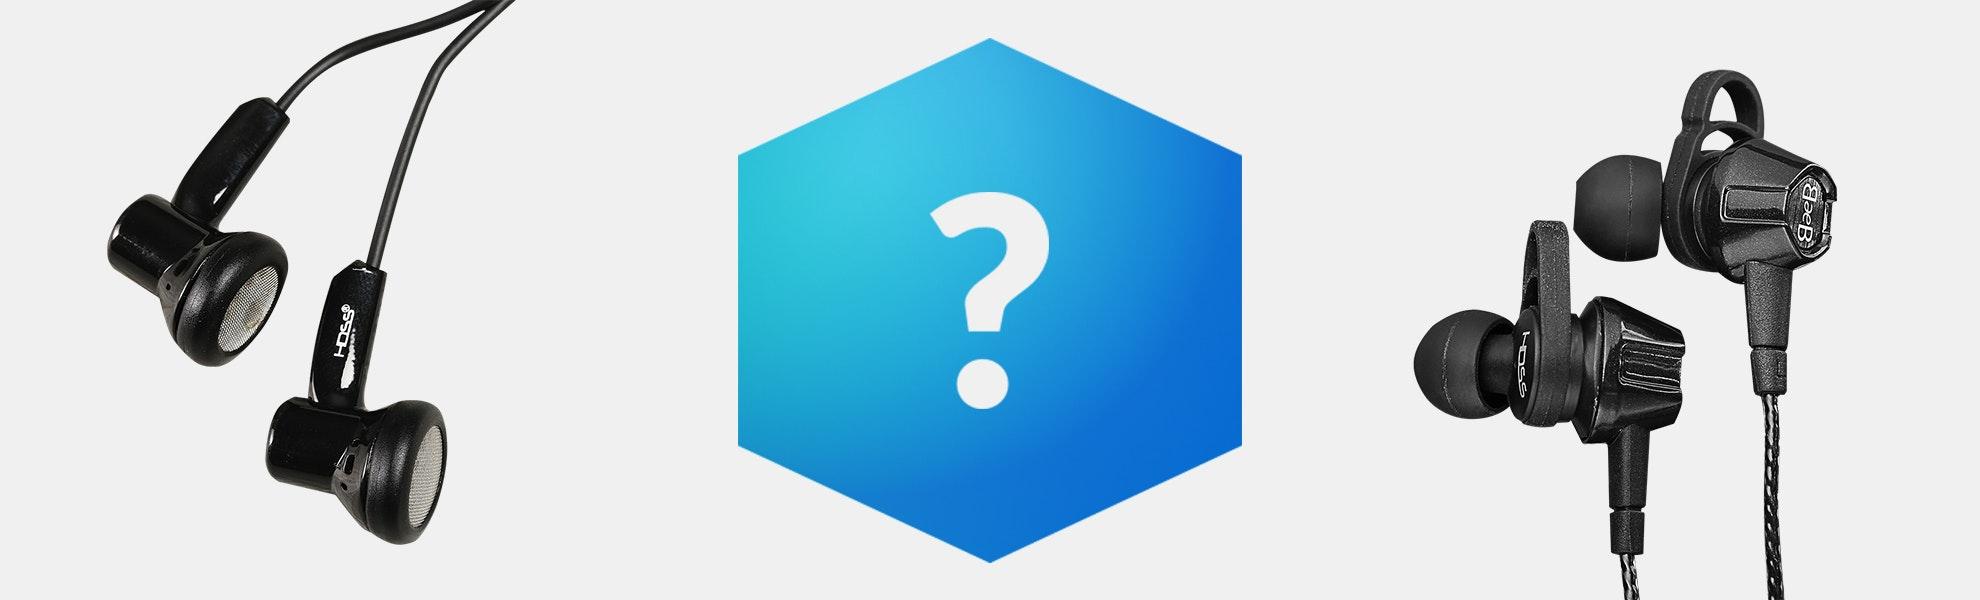 Massdrop Blue Box: Blue Ever Blue